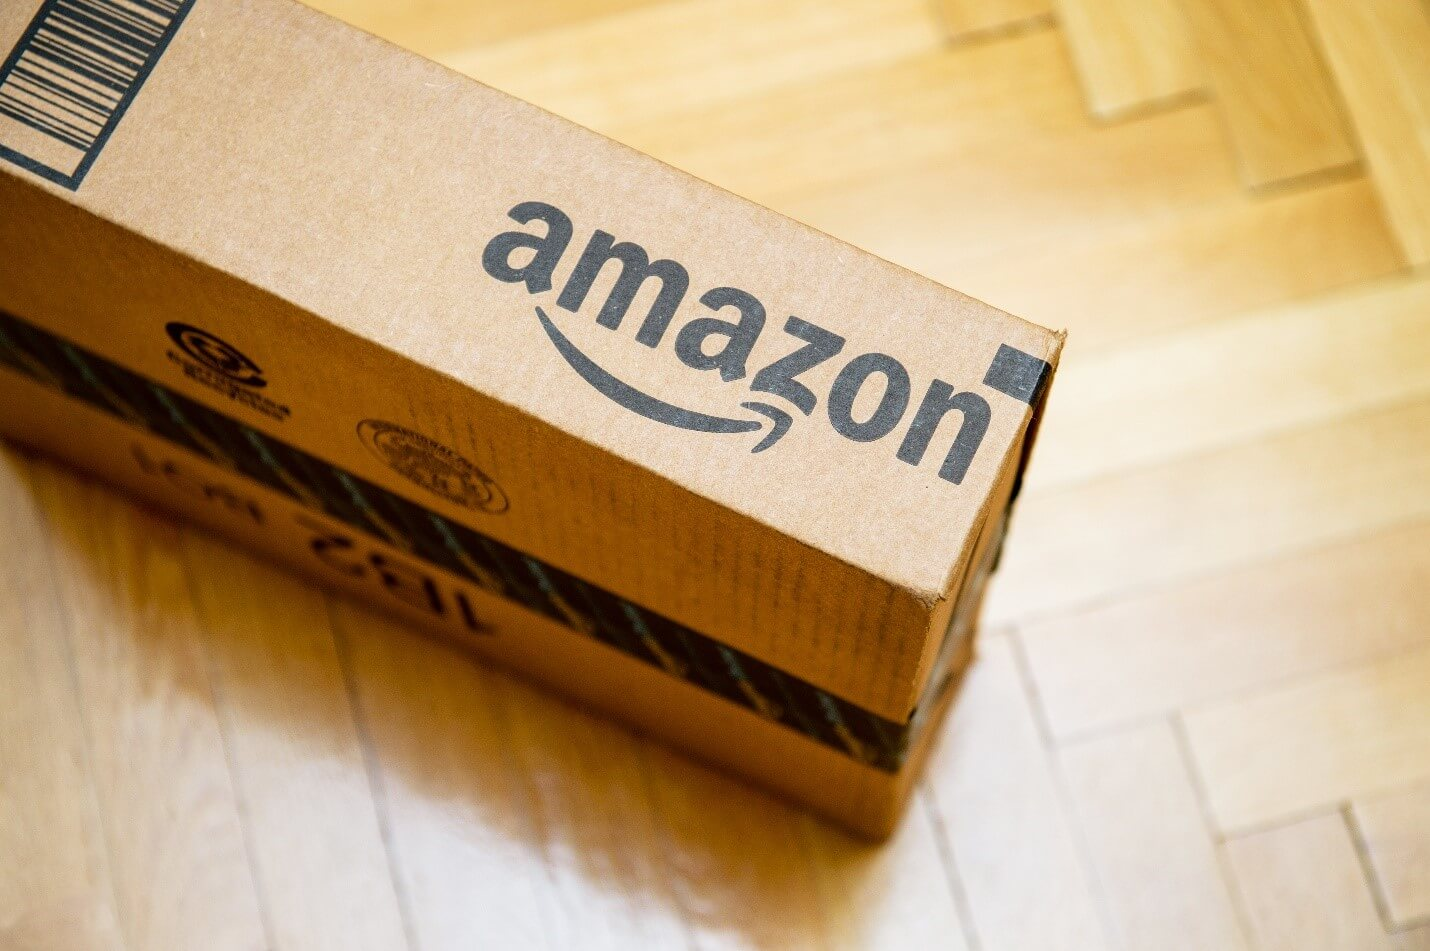 Amazon delivery box on the floor